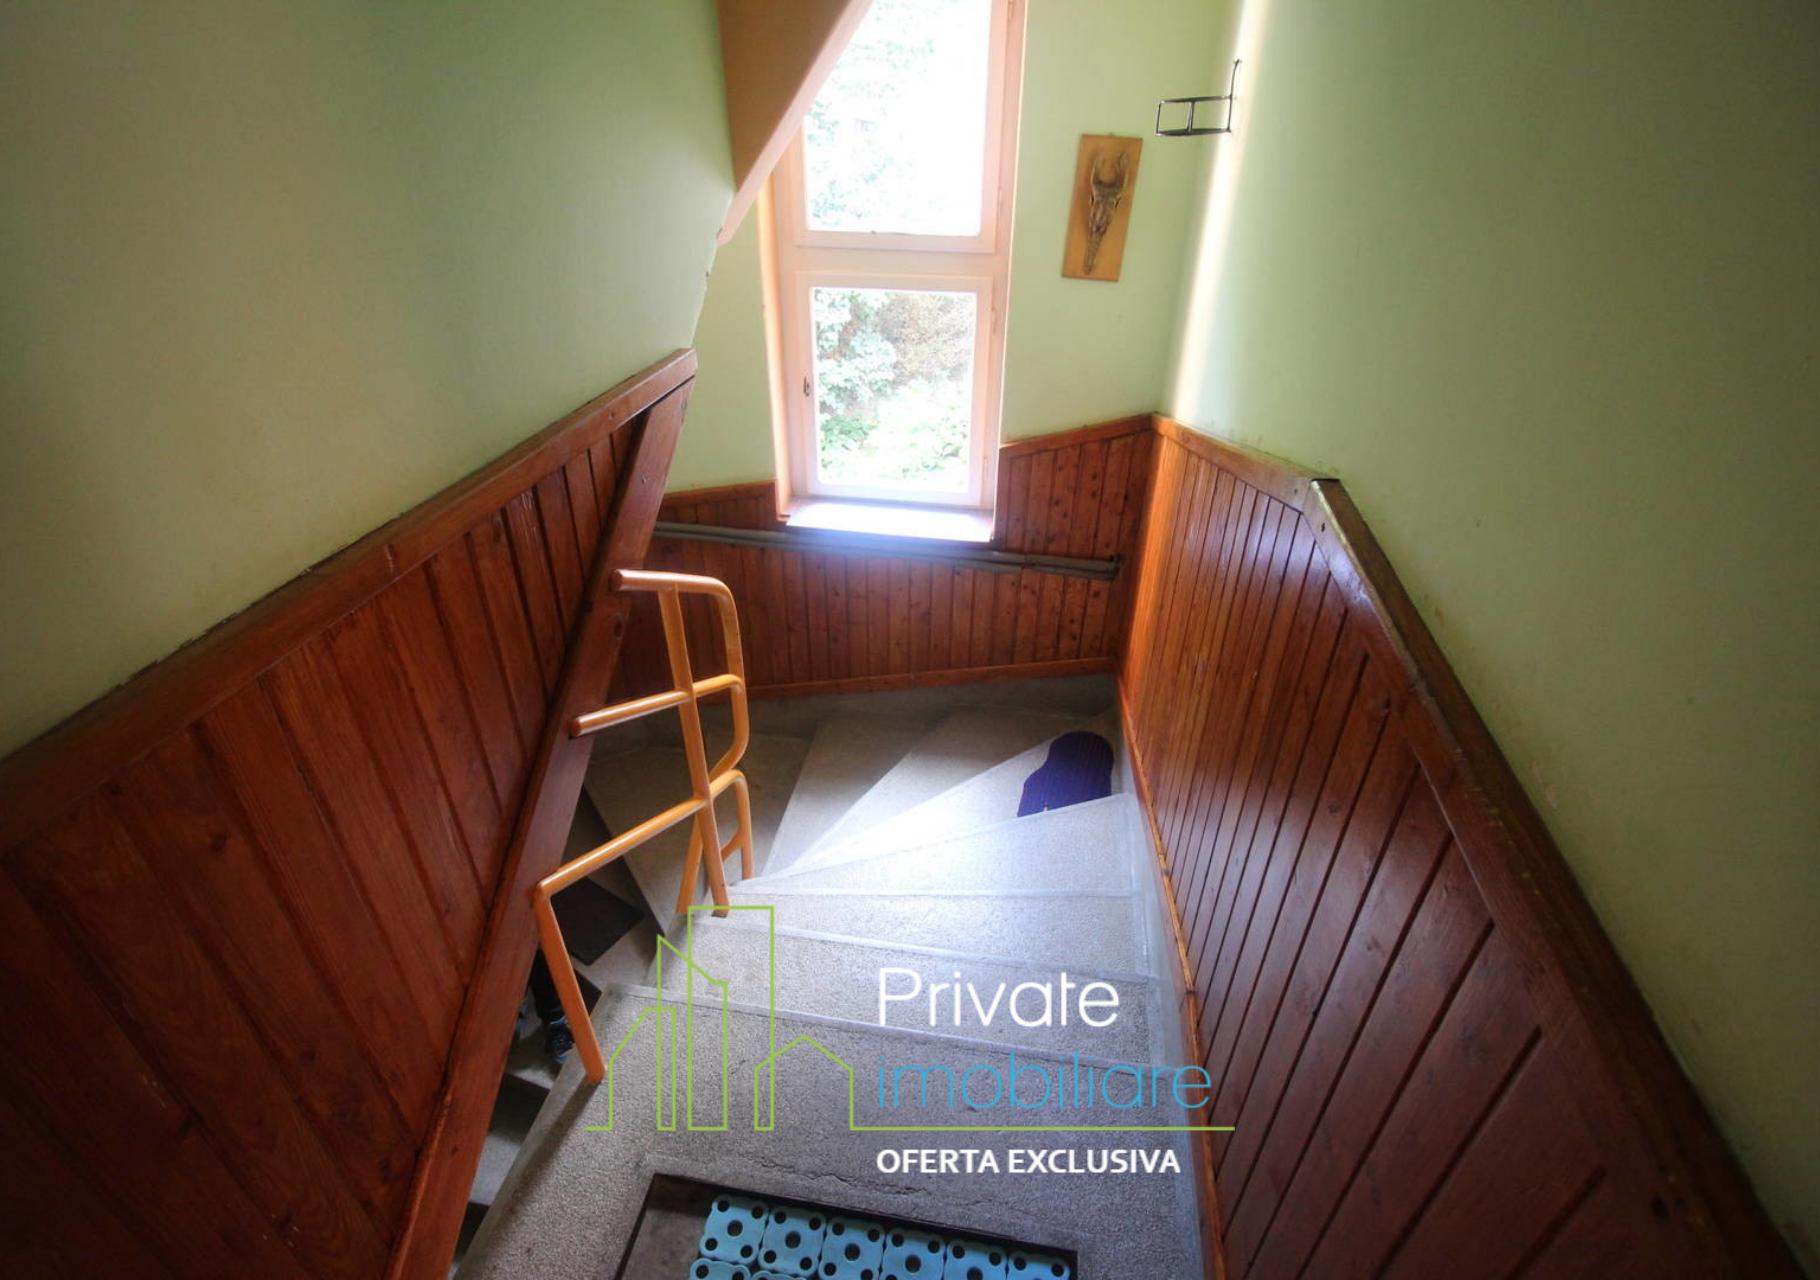 Toilet,                Property,                Room,                Bathroom,                Purple,                Plumbing,                Fixture,                Wall,                Floor,                Product,                Tile,                Black,                Red,                 Free Image